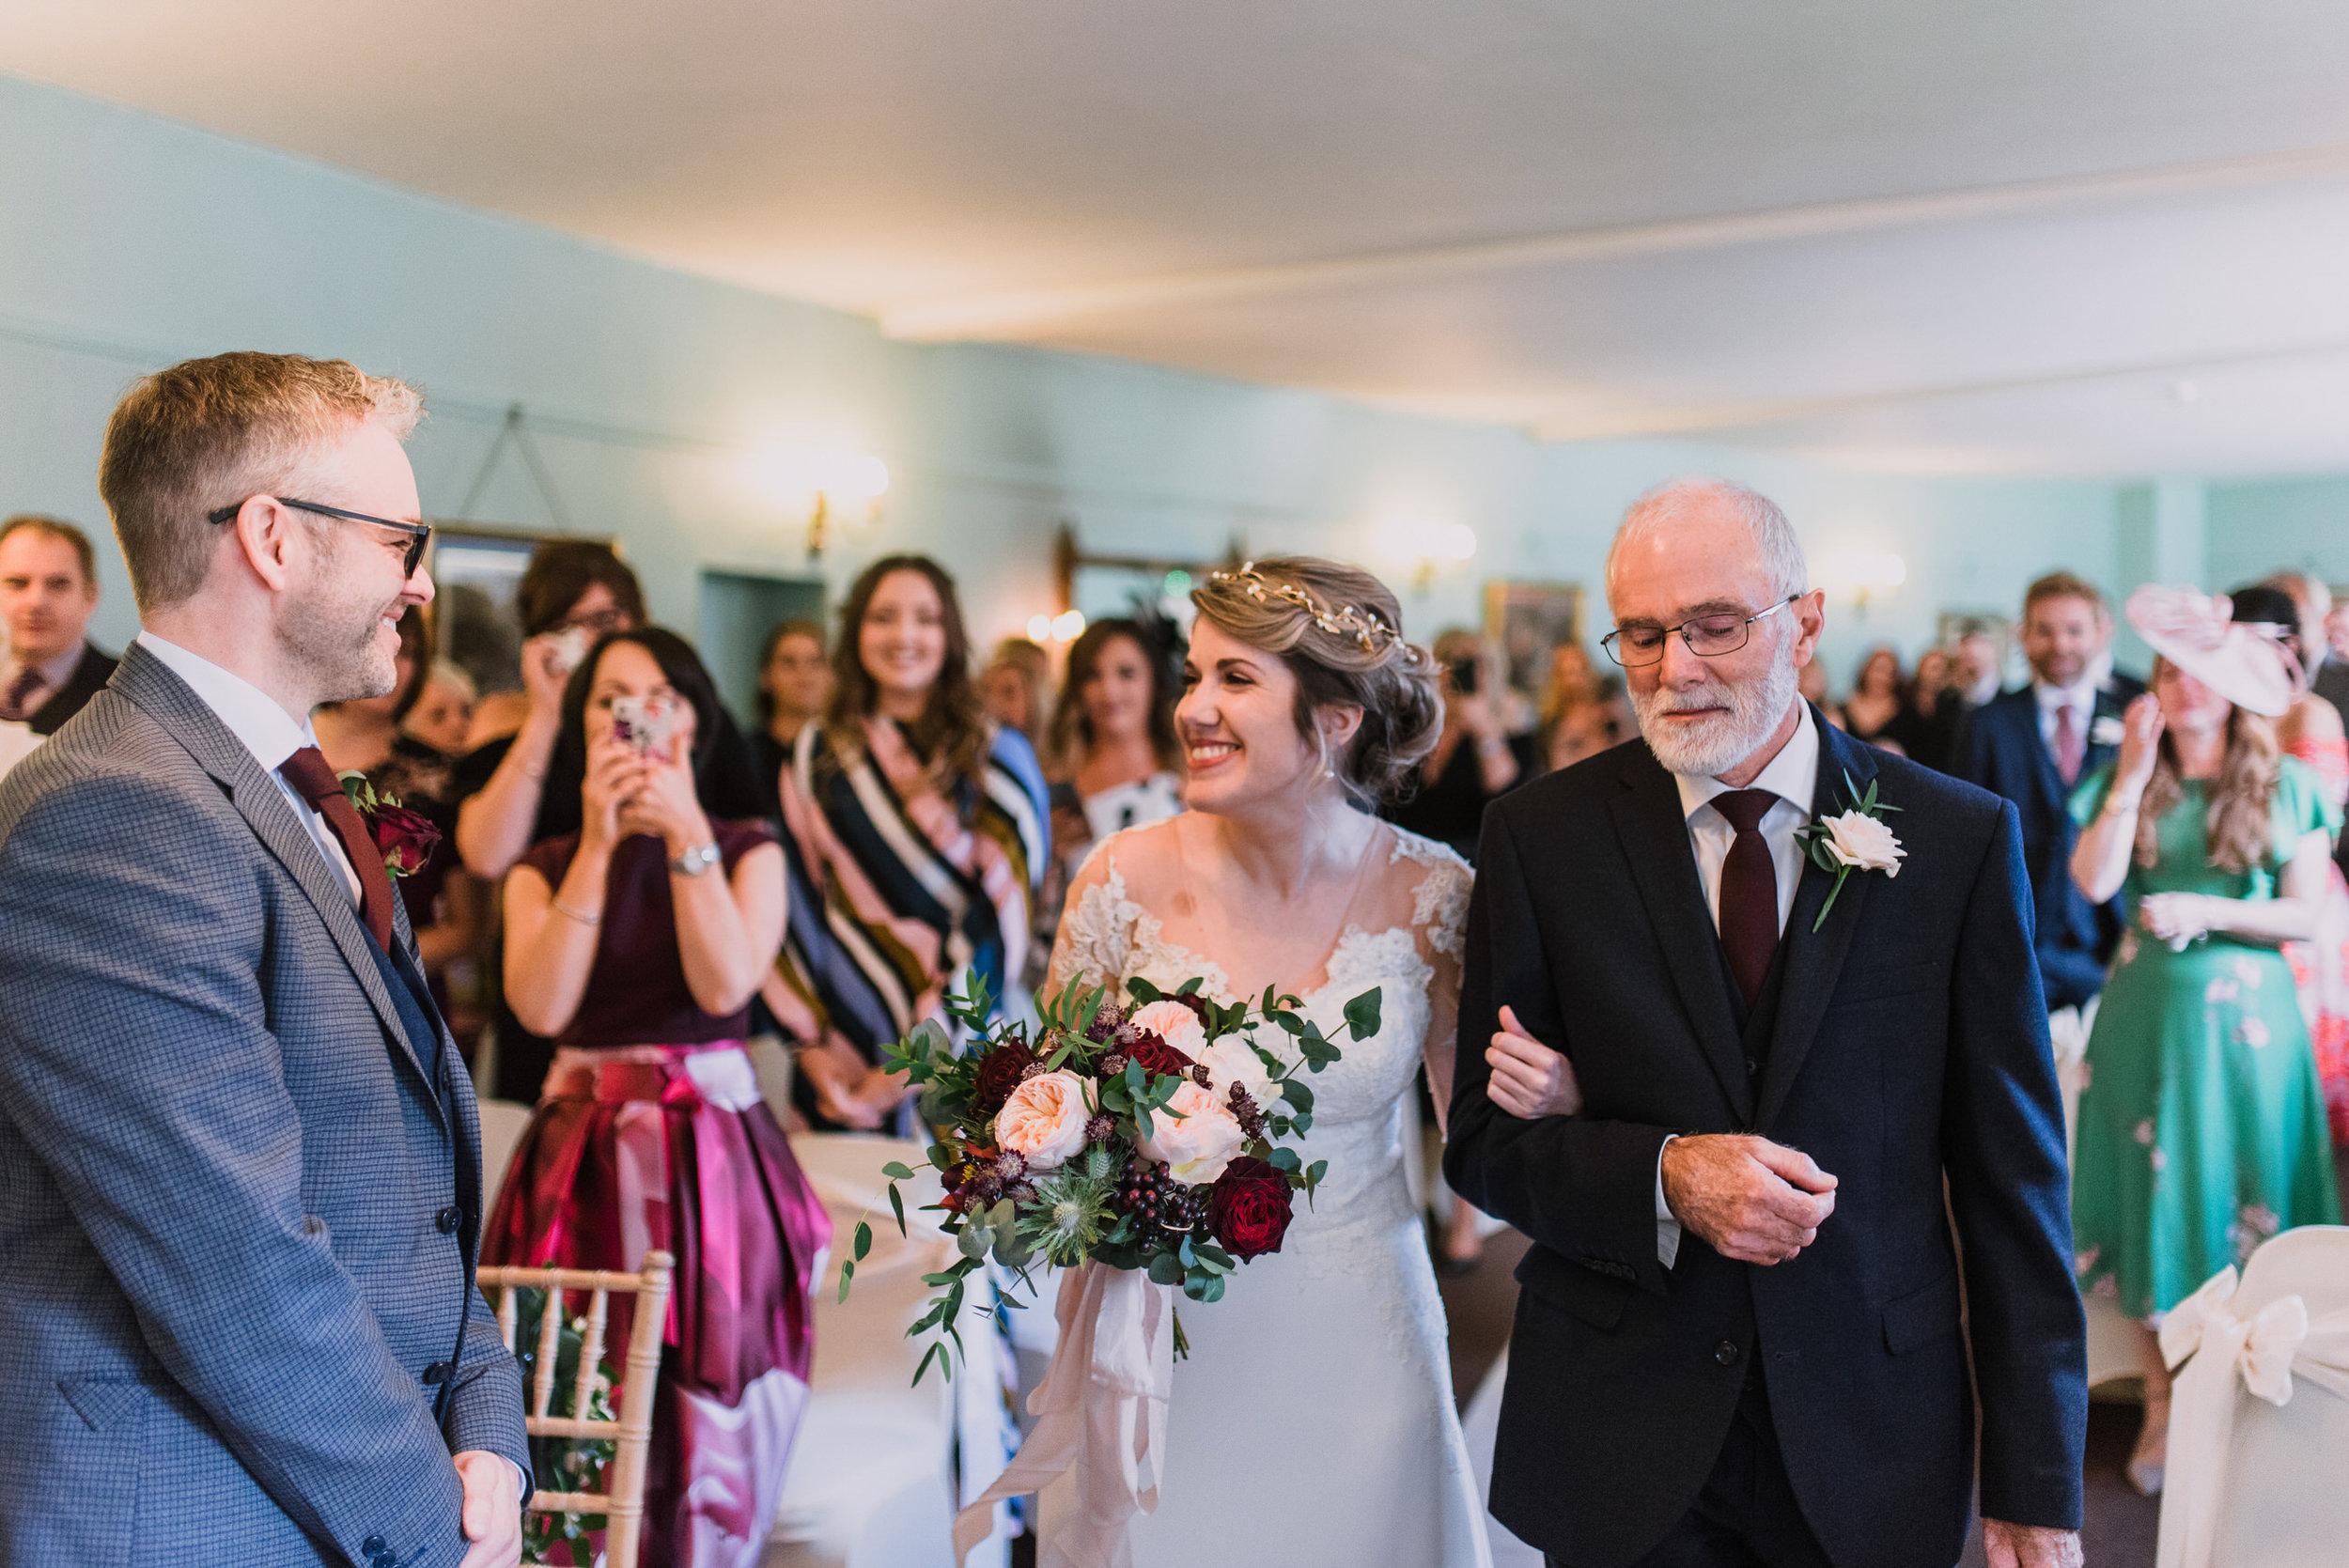 lissanoure castle wedding, northern ireland wedding photographer, romantic northern irish wedding venue, castle wedding ireland, natural wedding photography ni (48).jpg